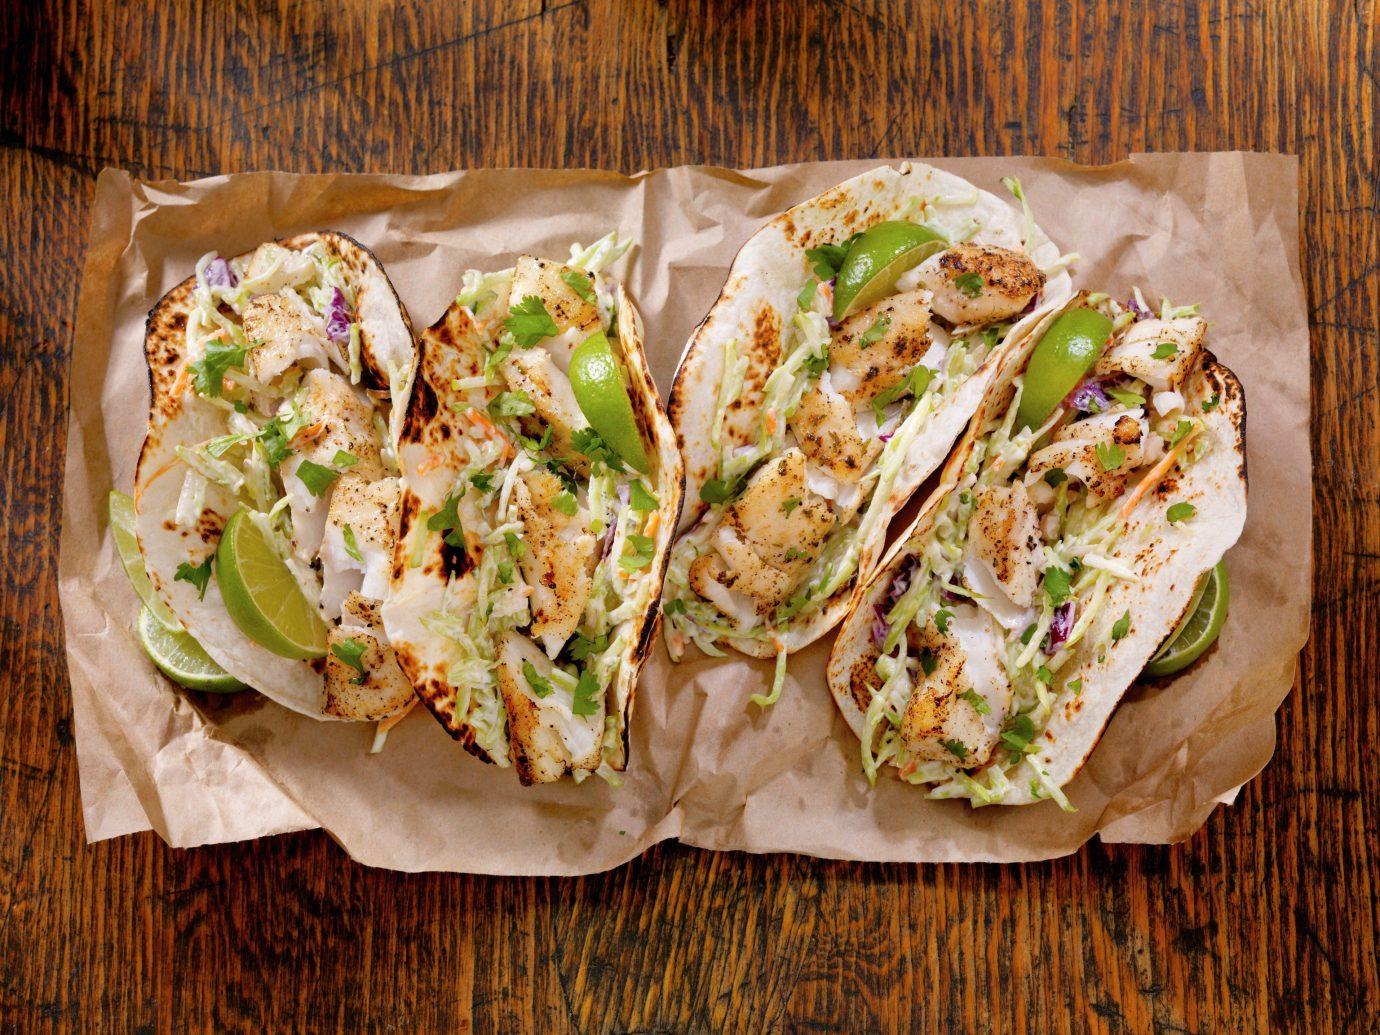 Food + Drink food dish wooden produce vegetable land plant cuisine taco meal salad snack food flowering plant breakfast sandwich bread